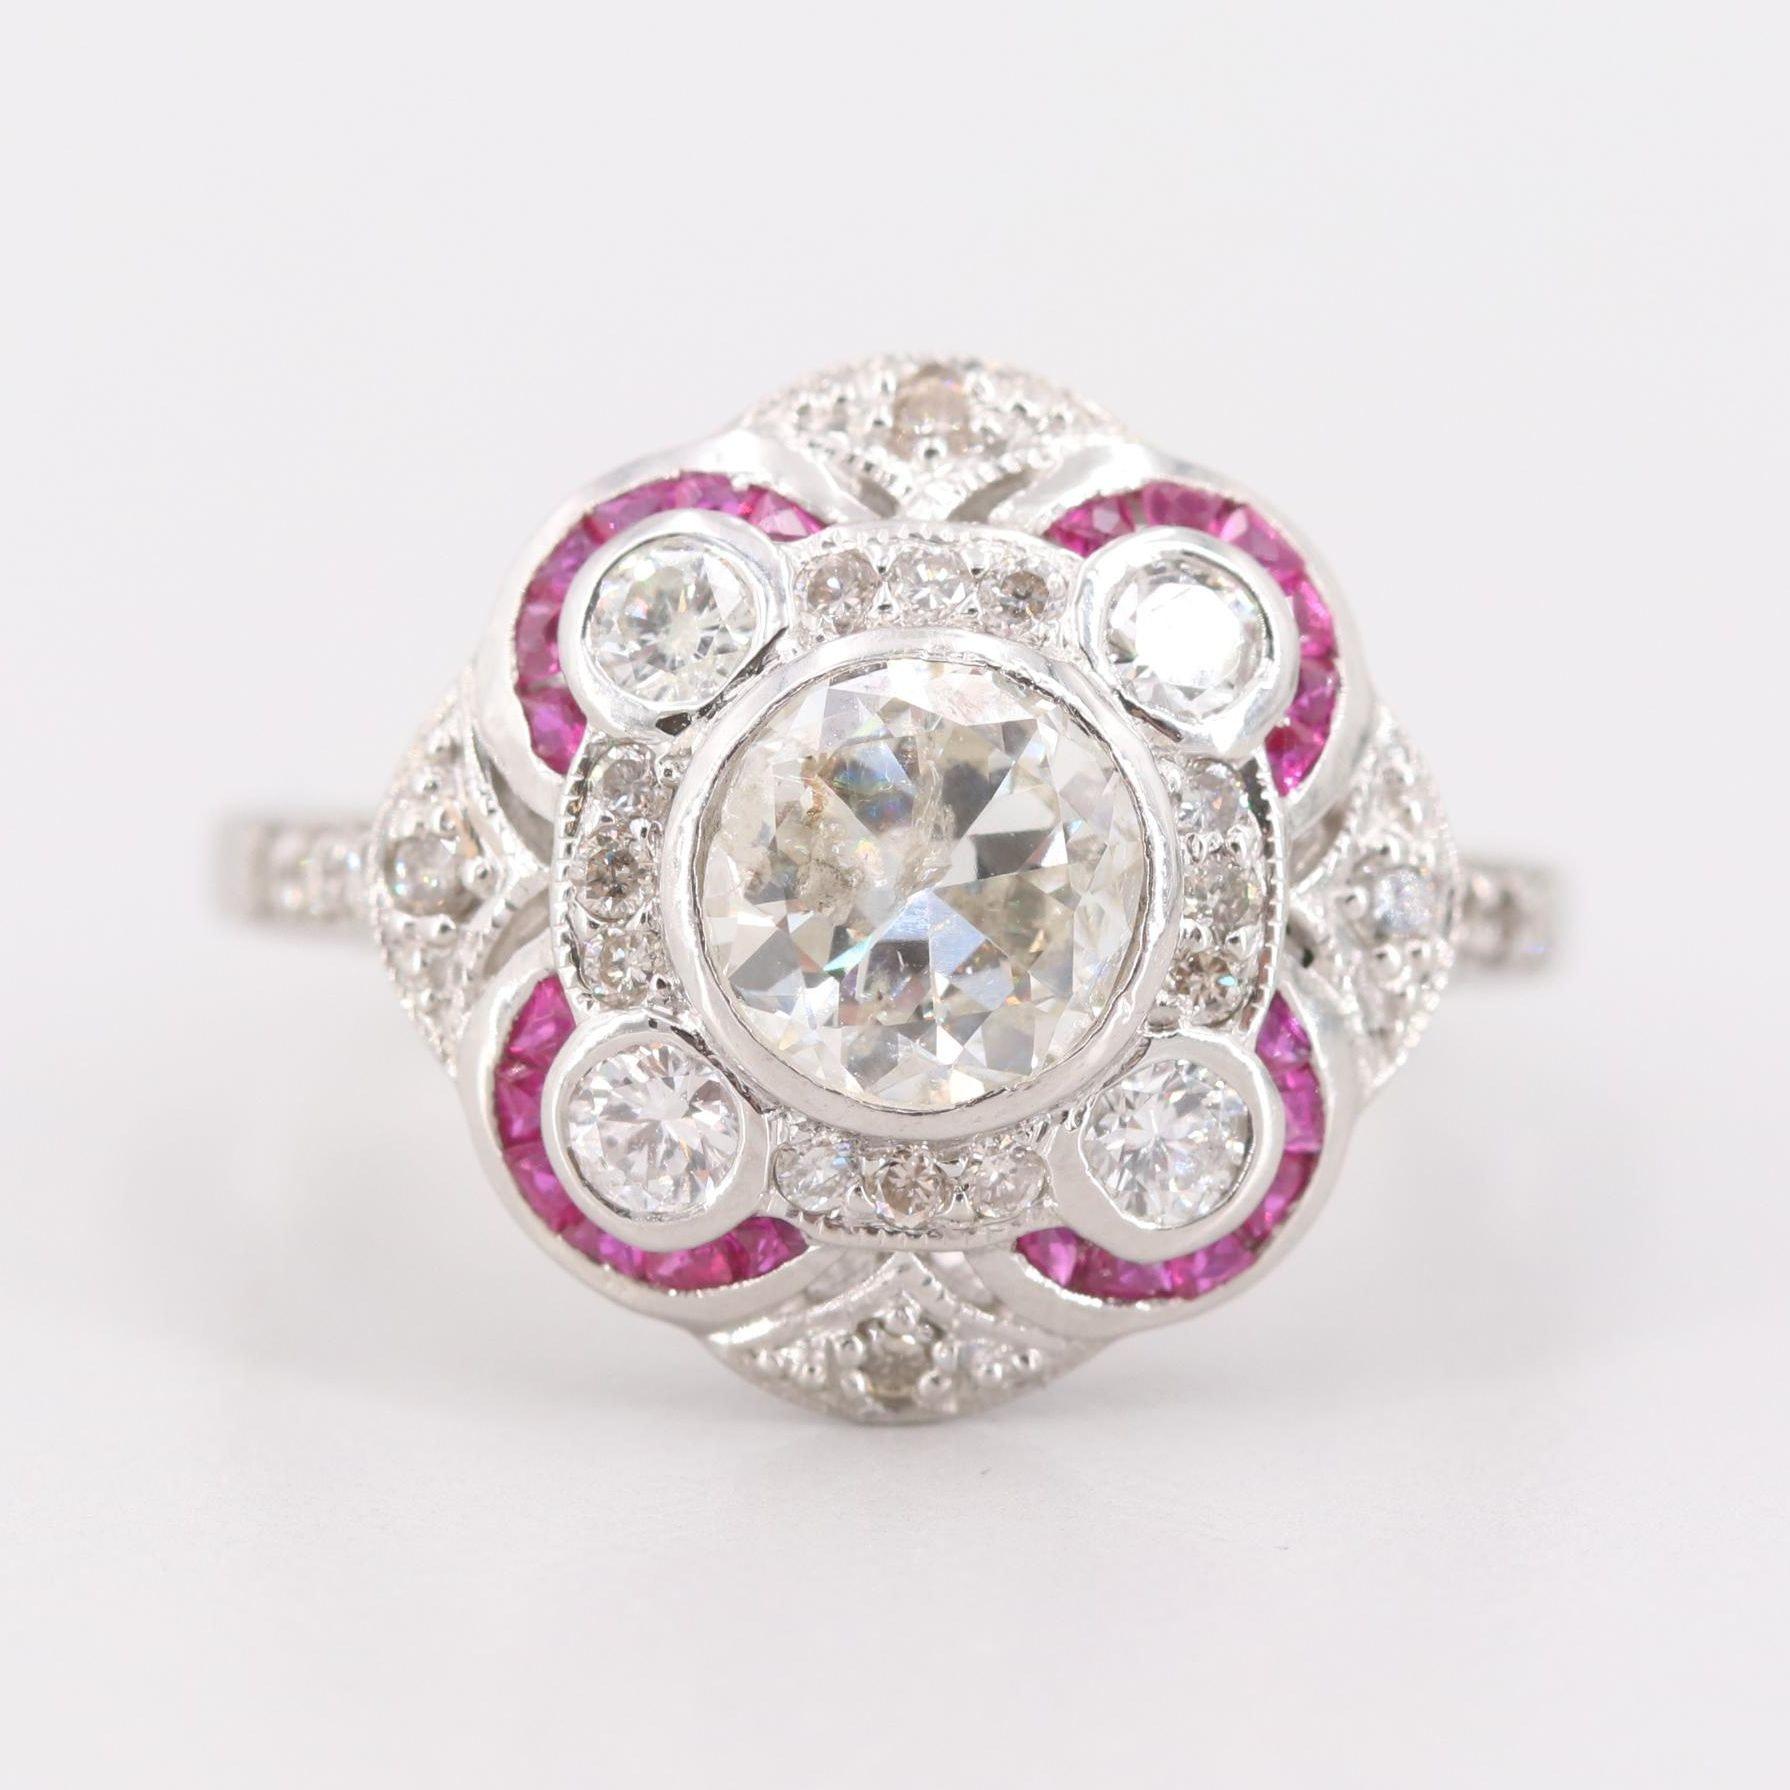 Platinum 1.59 CTW Diamond and Ruby Ring